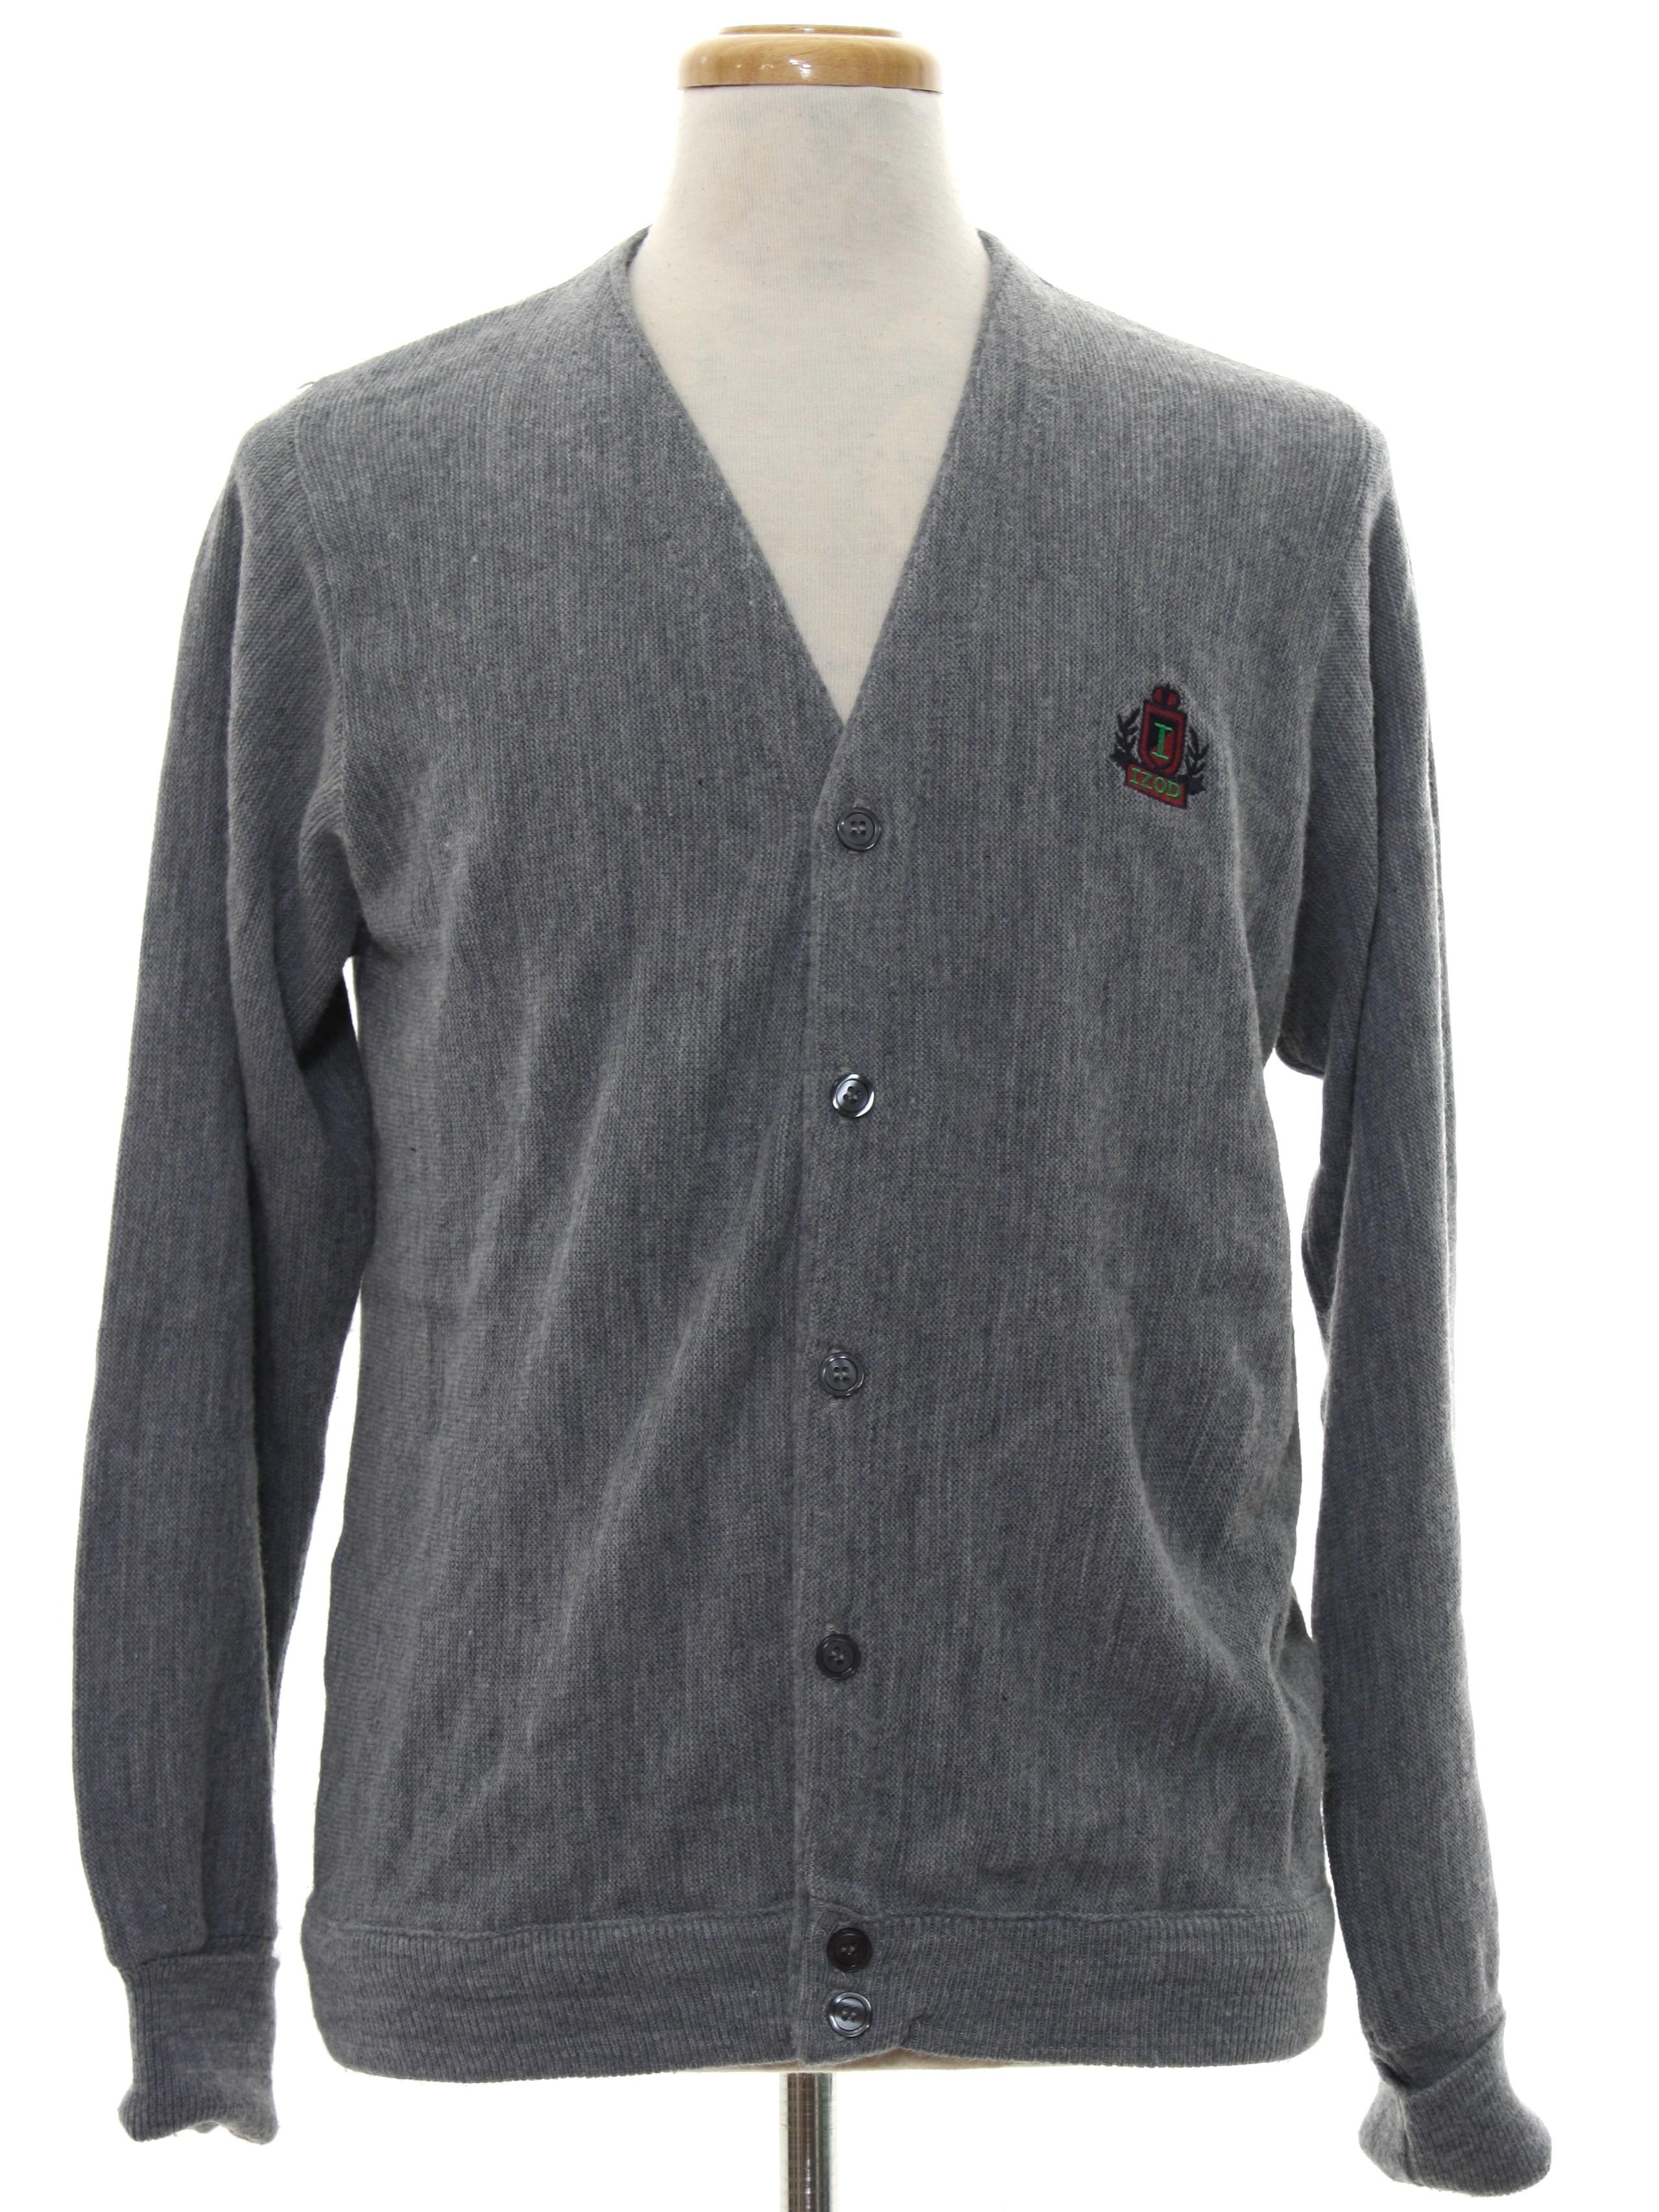 Vintage Izod 80's Caridgan Sweater: 80s -Izod- Mens heather grey ...